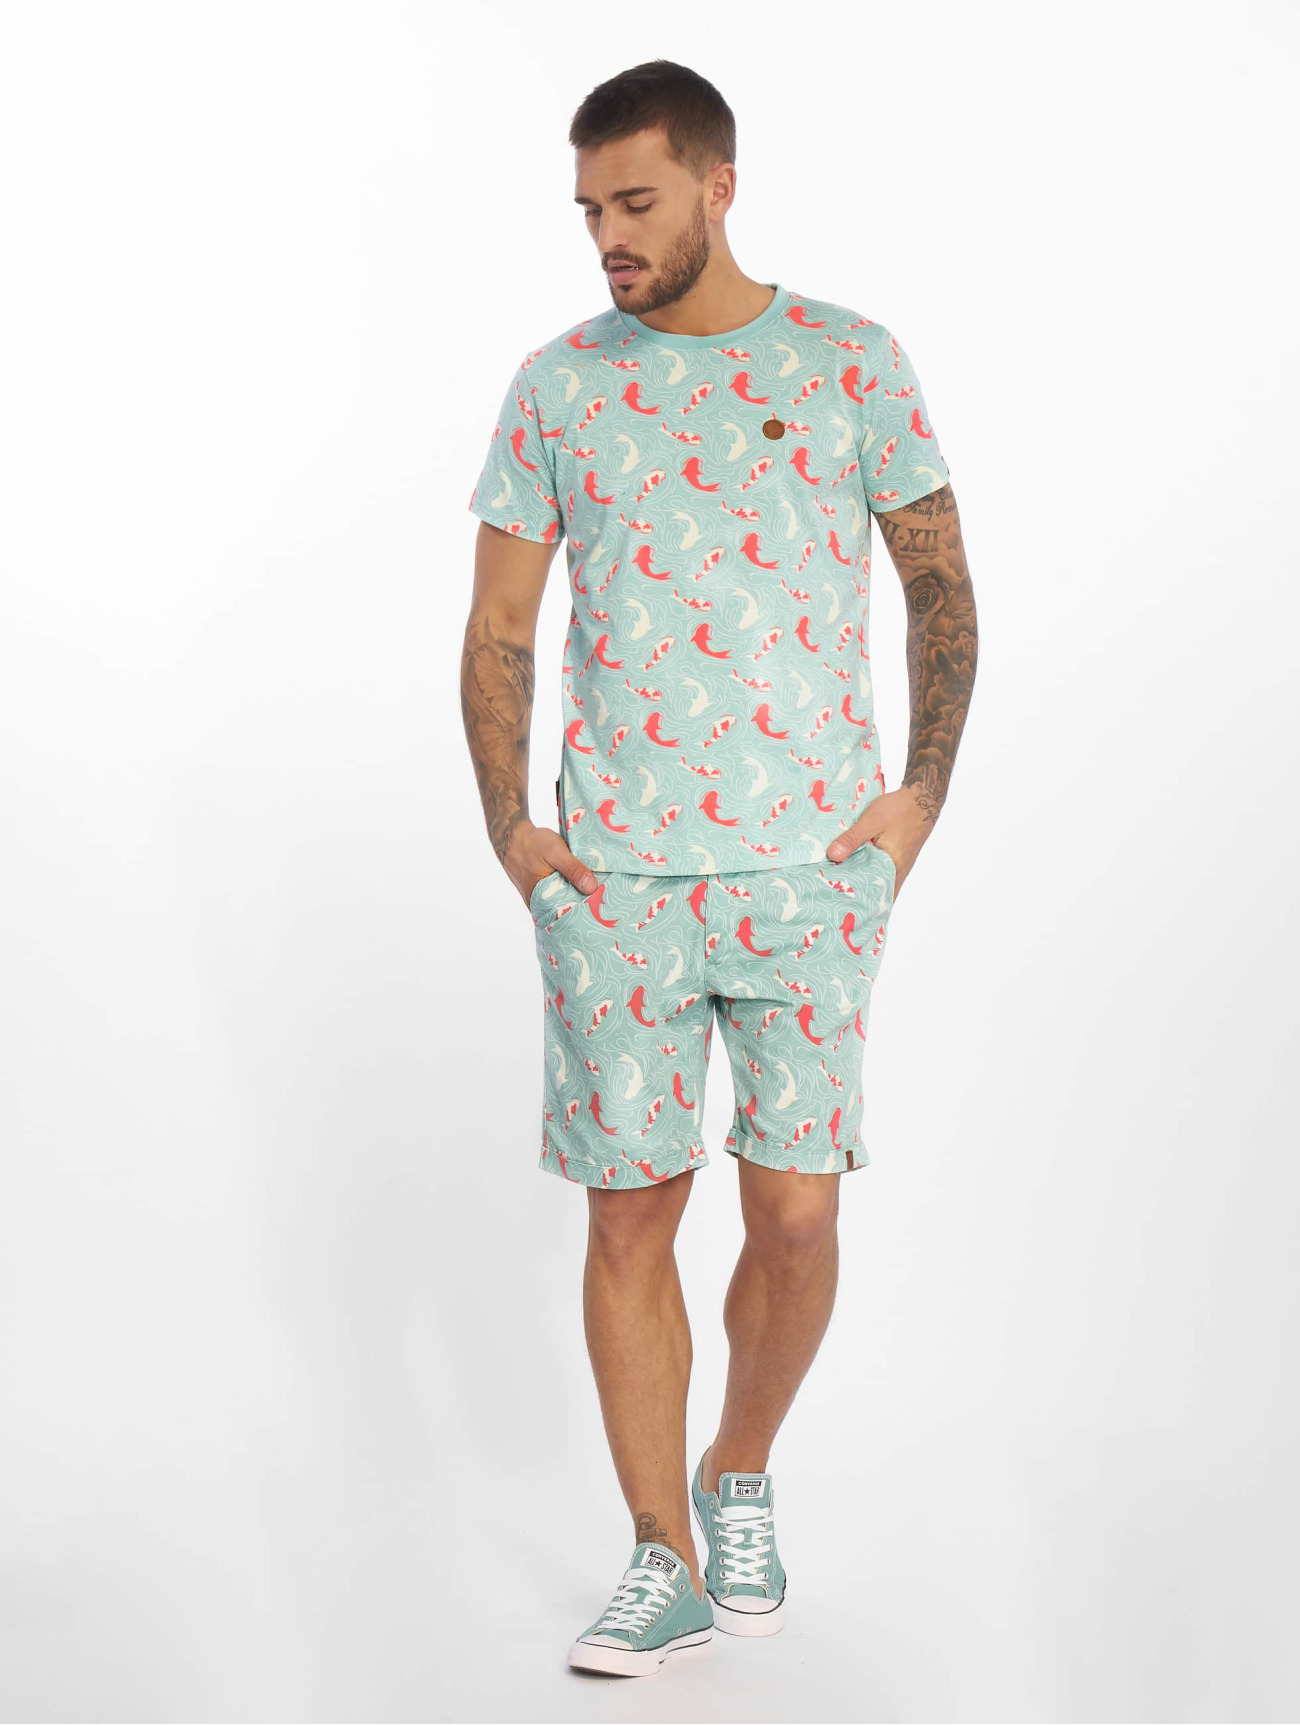 Alife & Kickin  Pumpkin B  turquoise Homme Short  600181 Homme Pantalons & Shorts